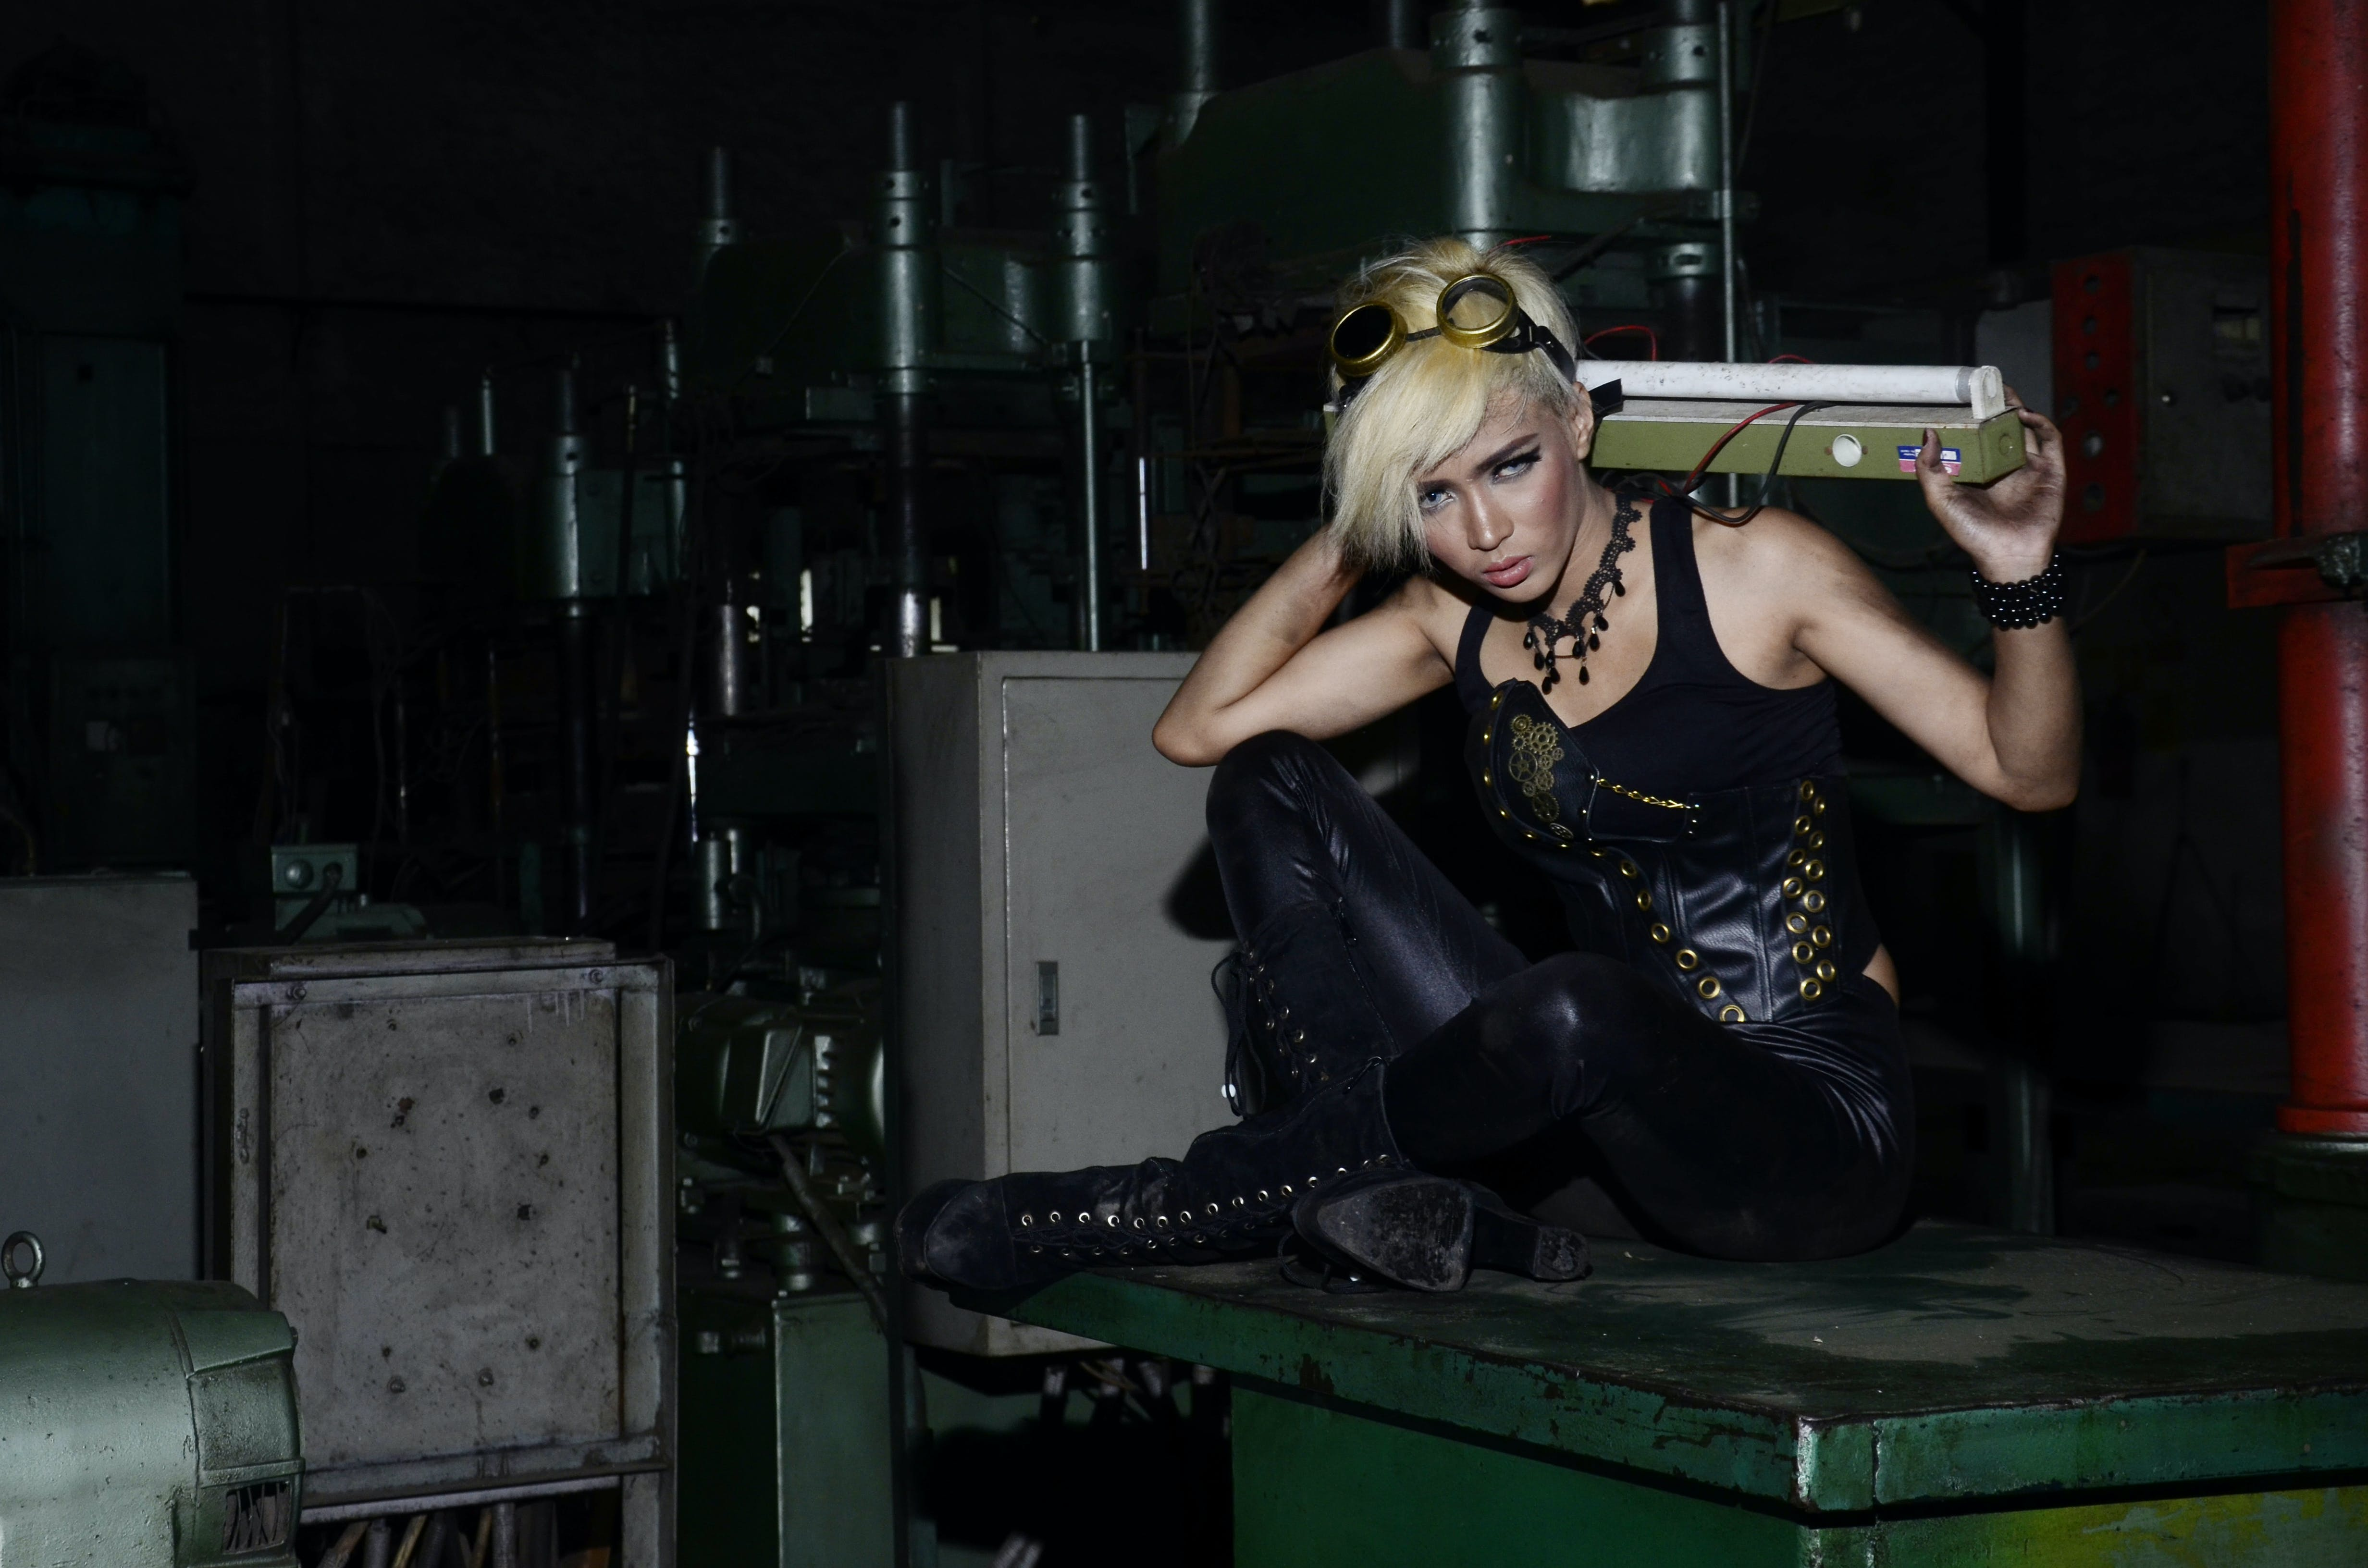 Woman Sitting on Green Metal Industrial Machine